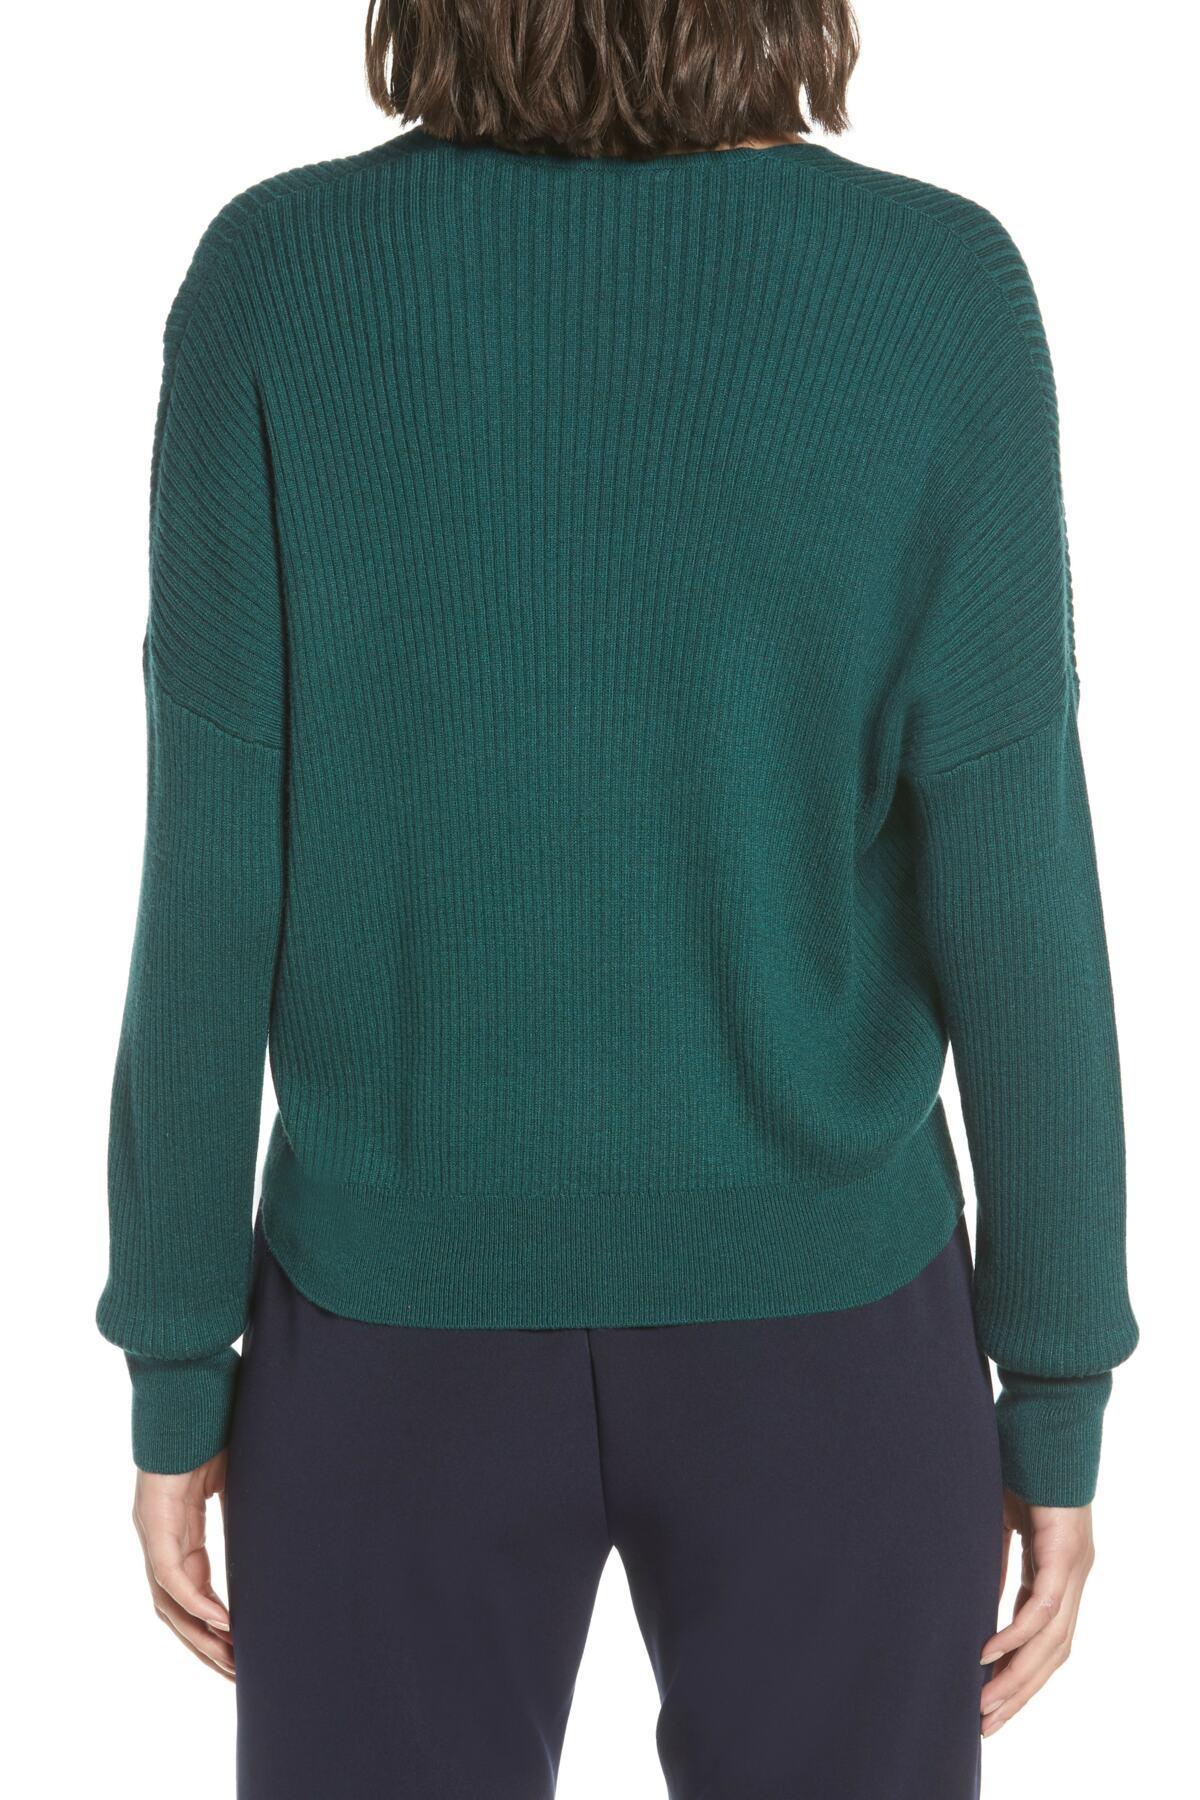 bbdeeaeb3 Lyst - Leith Rib Wrap Sweater (regular   Plus Size) in Green